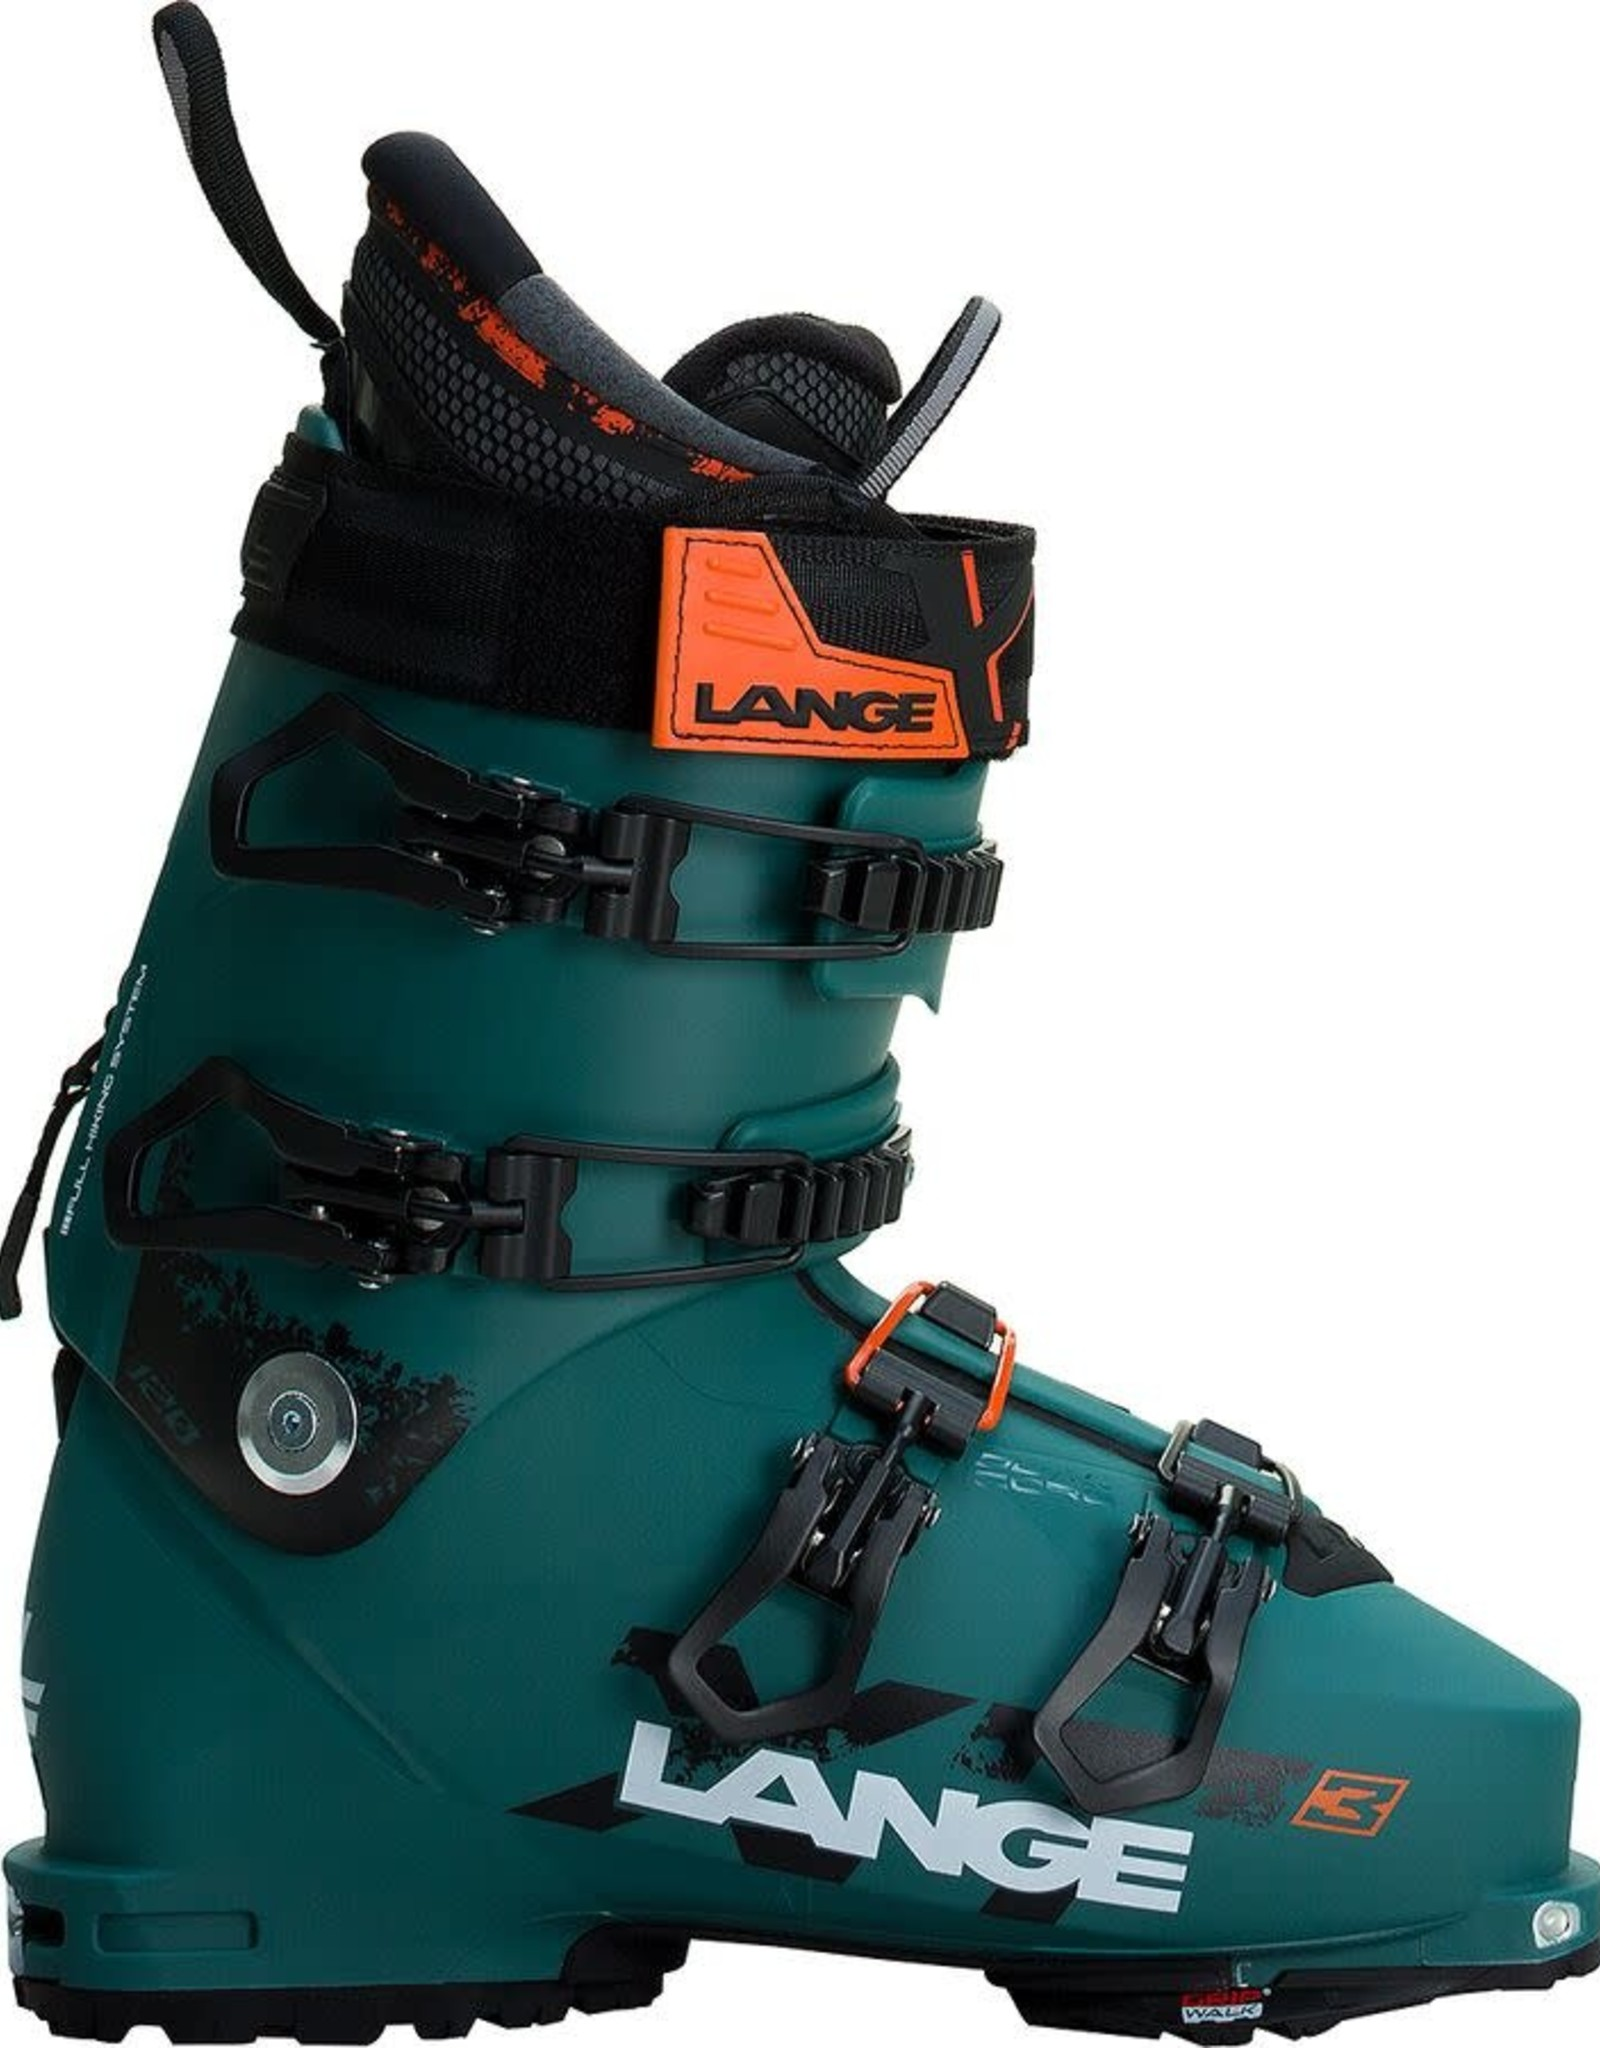 Lange LANGE Ski Boots XT3 120 (21/22)